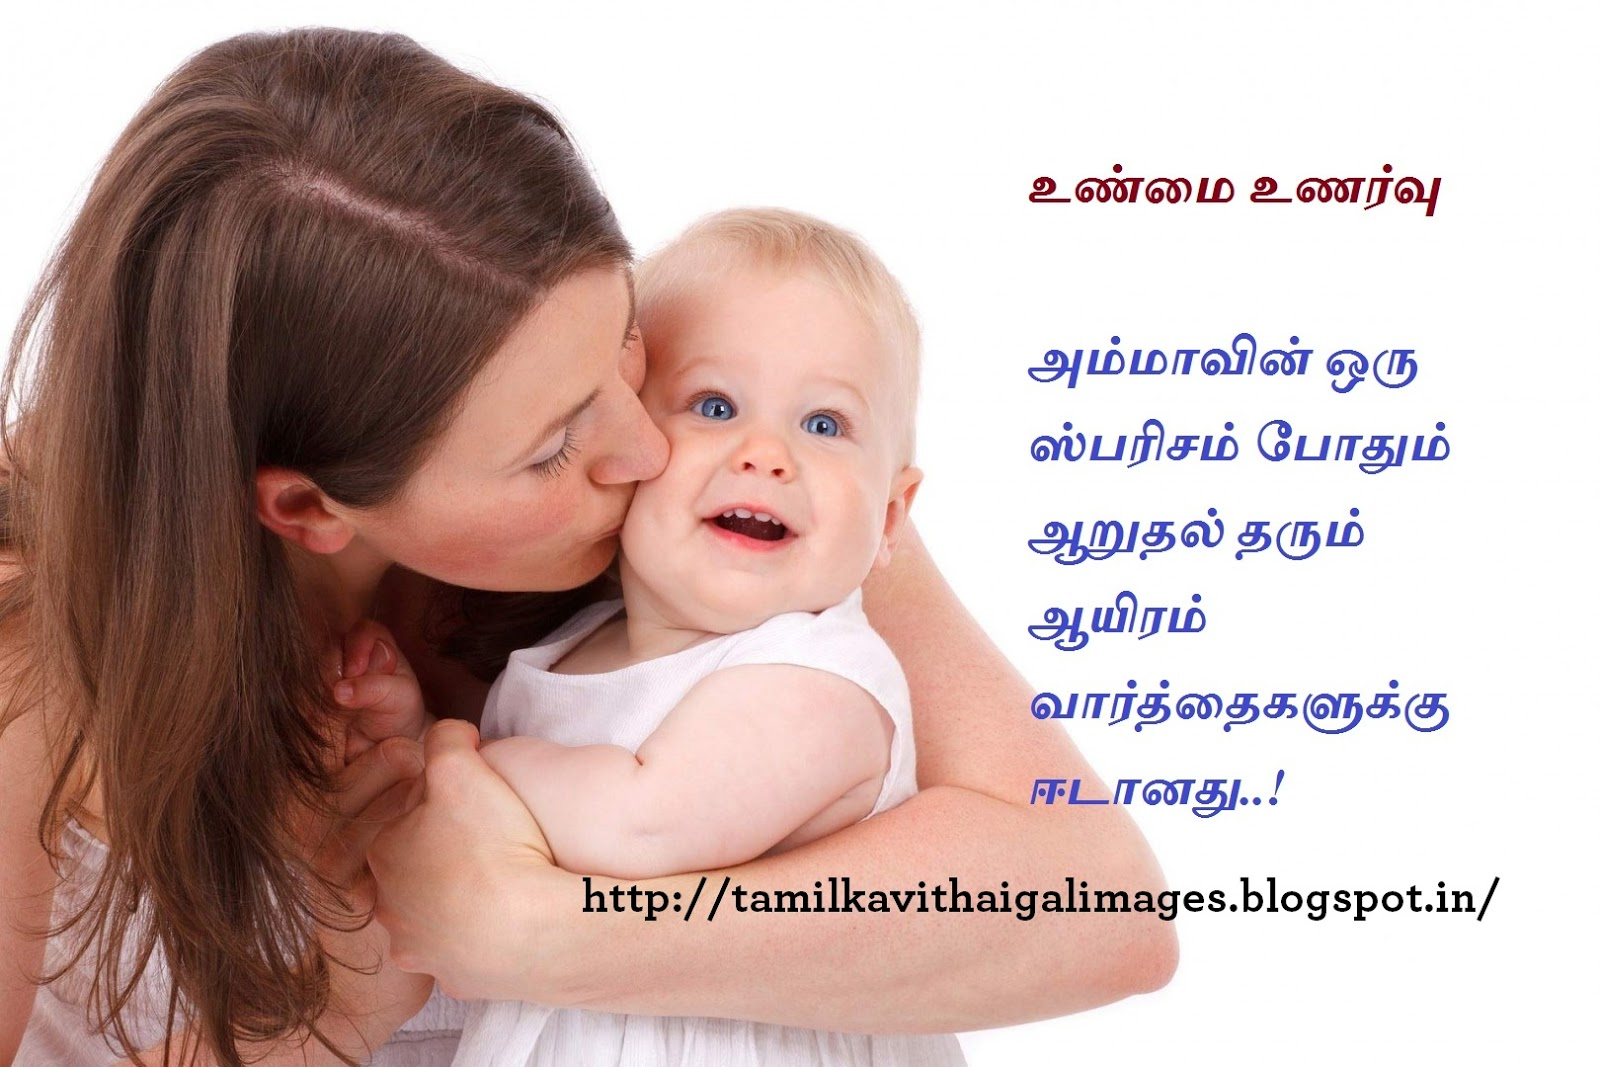 77 Best Whatsapp Status in Tamil-FUNNY LOVE SAD ATTITUDE